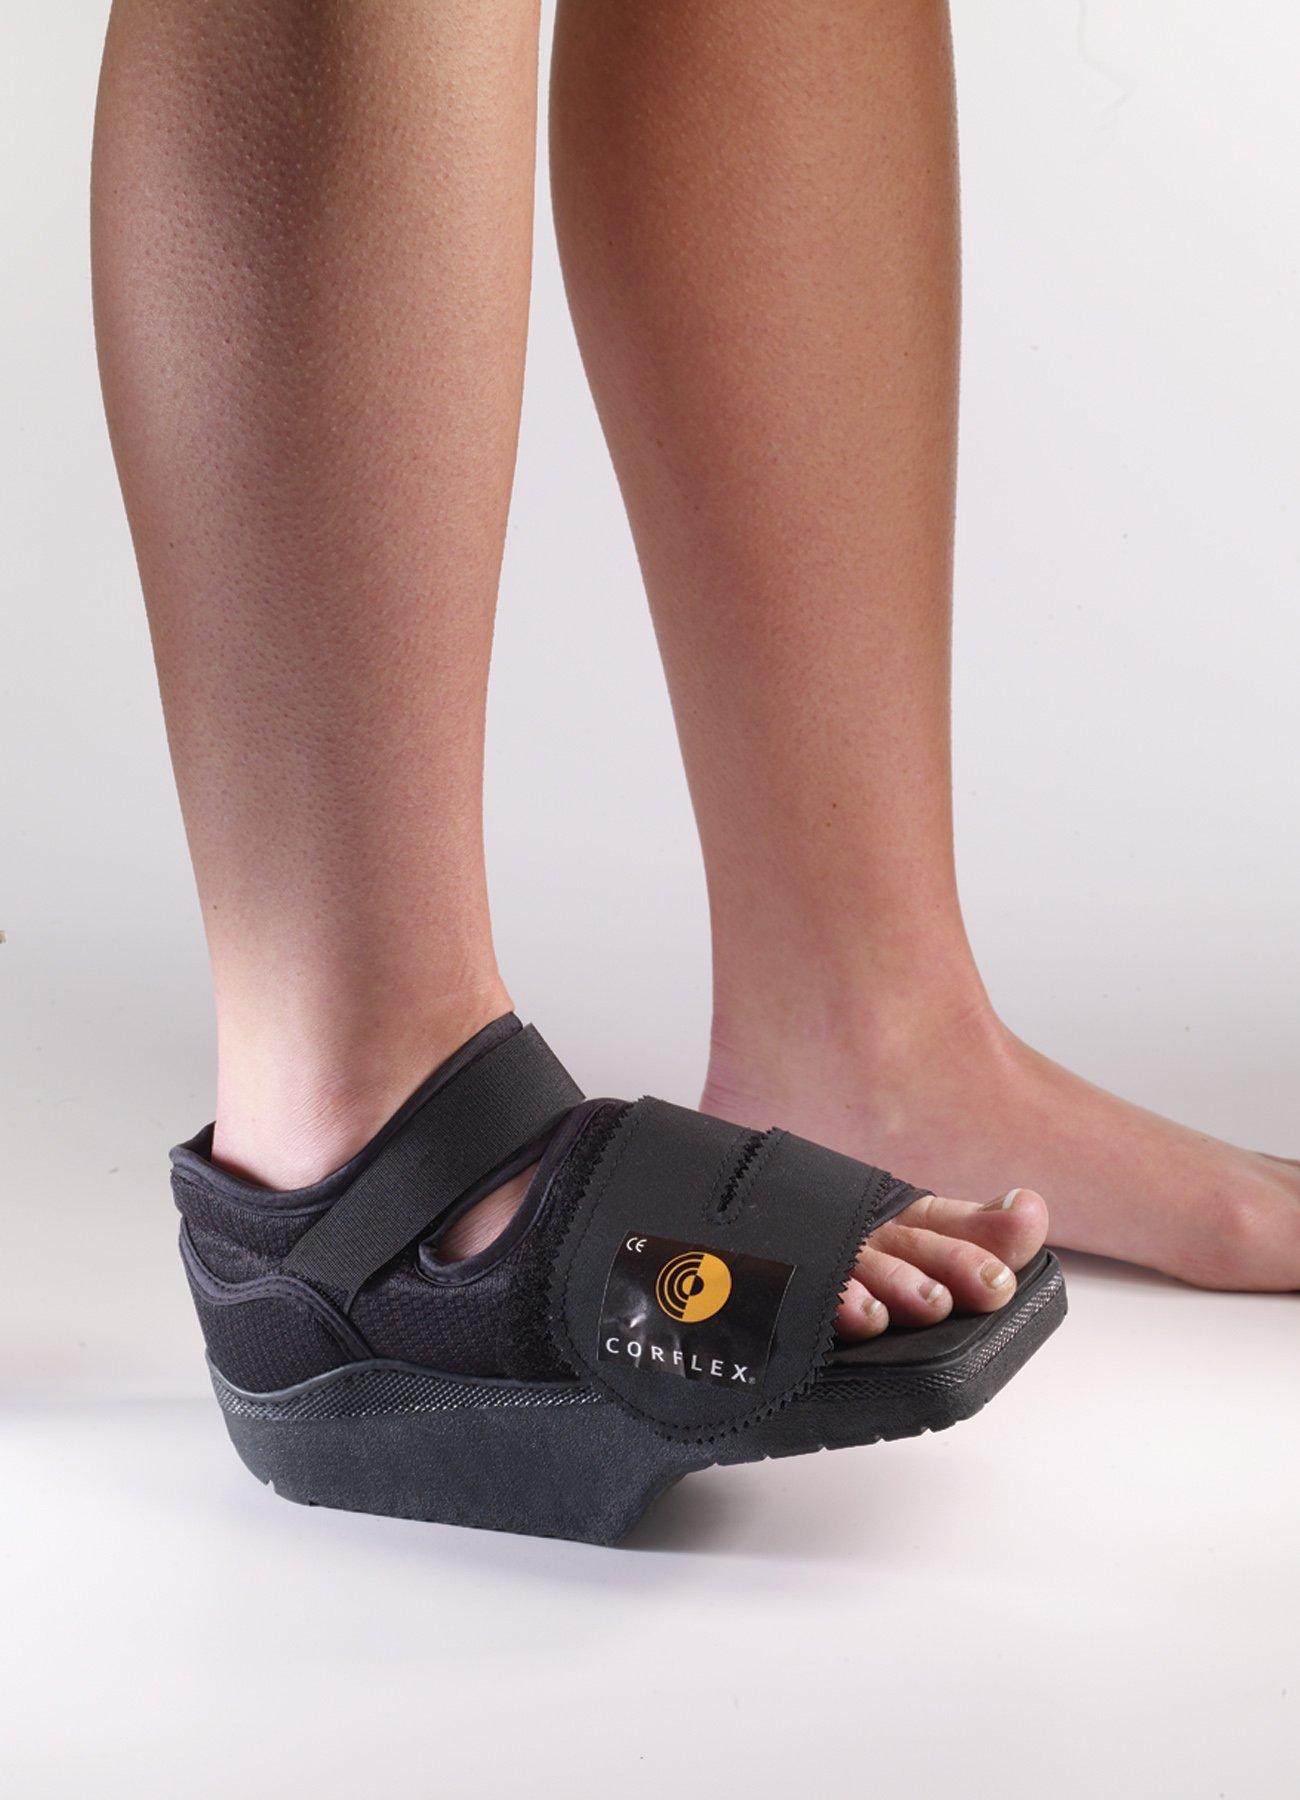 Darco Medium Orthowedge Black Shoe